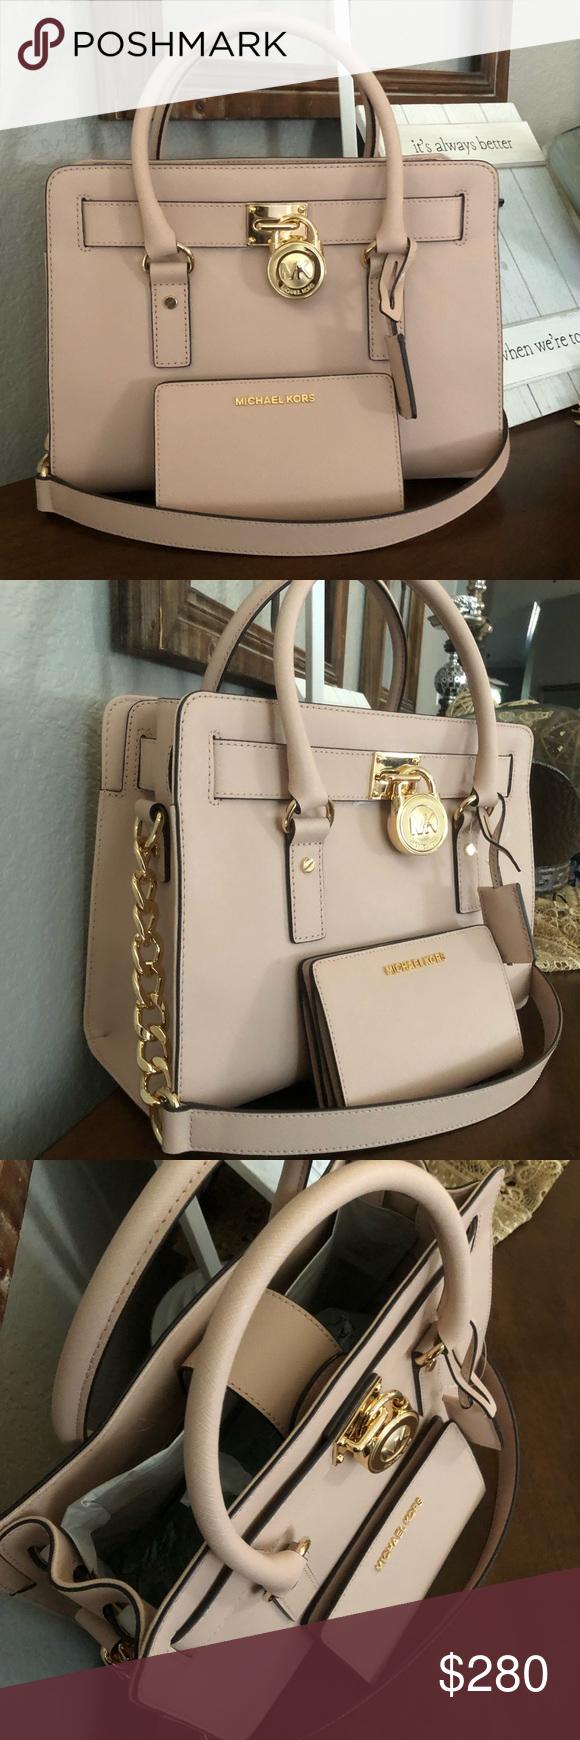 569aa09865f3 💖New Michael Kors Bag and wallet Michael Kors Hamilton Medium Lock and Key  (New